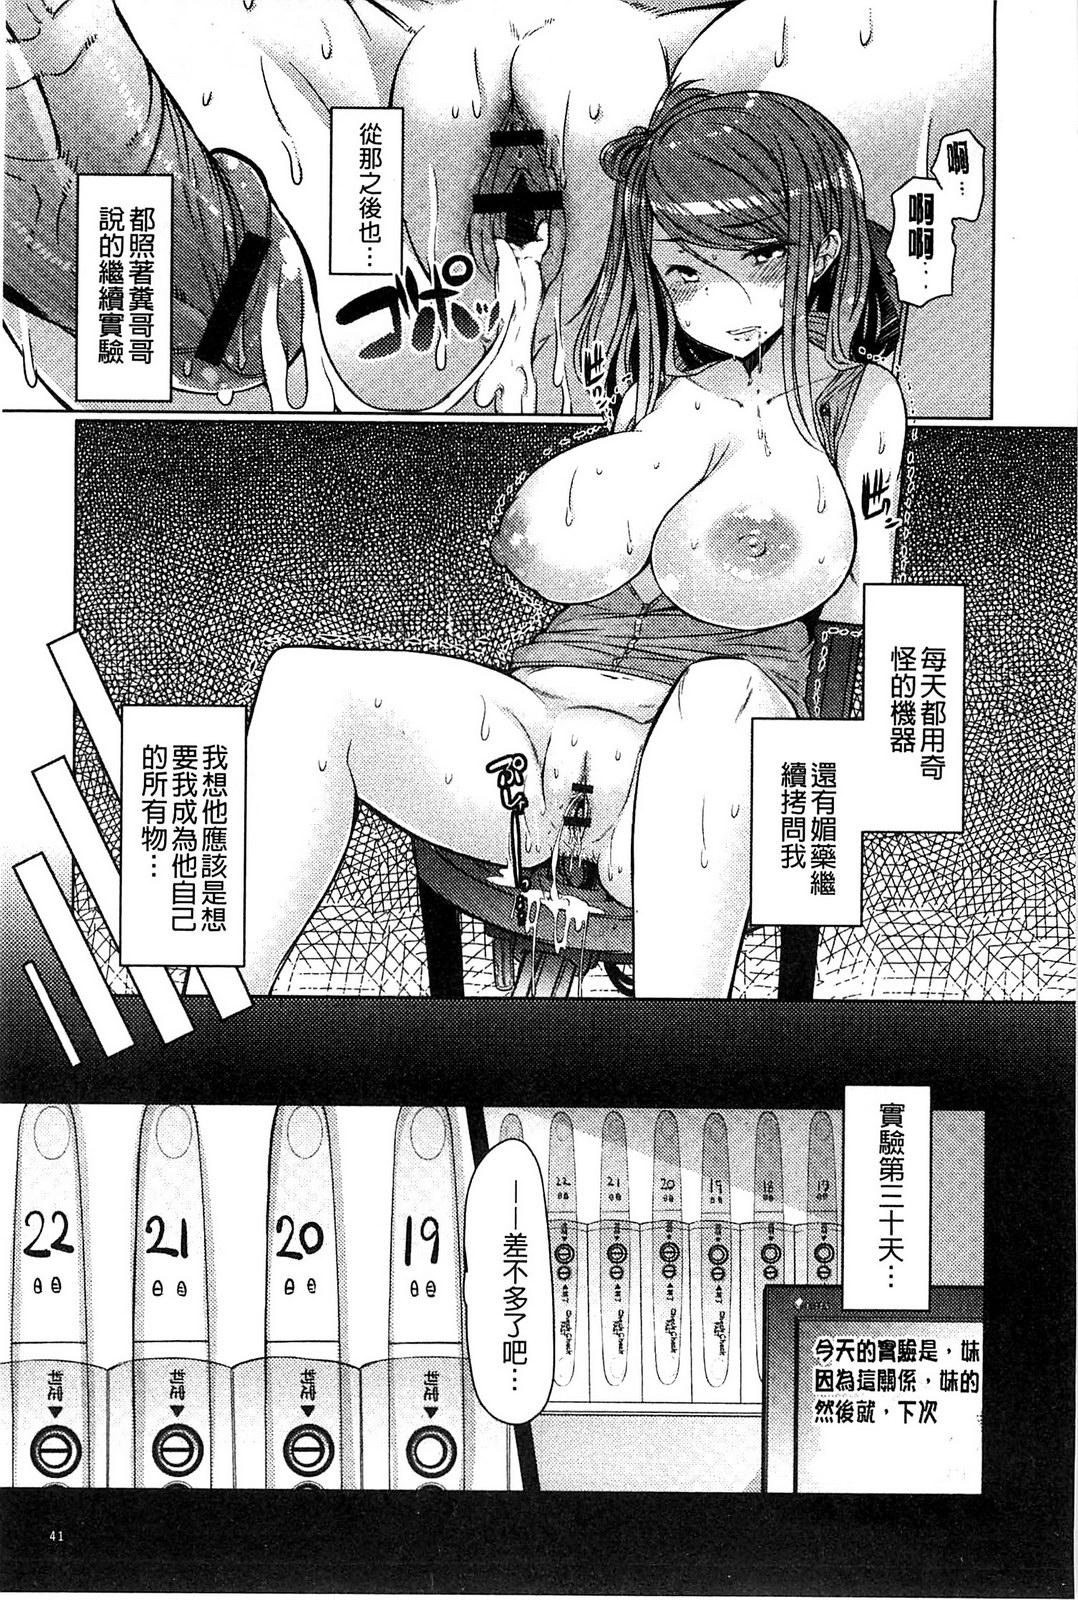 Imouto Kansatsu Nikki - The Record of Sex with My Sister 43